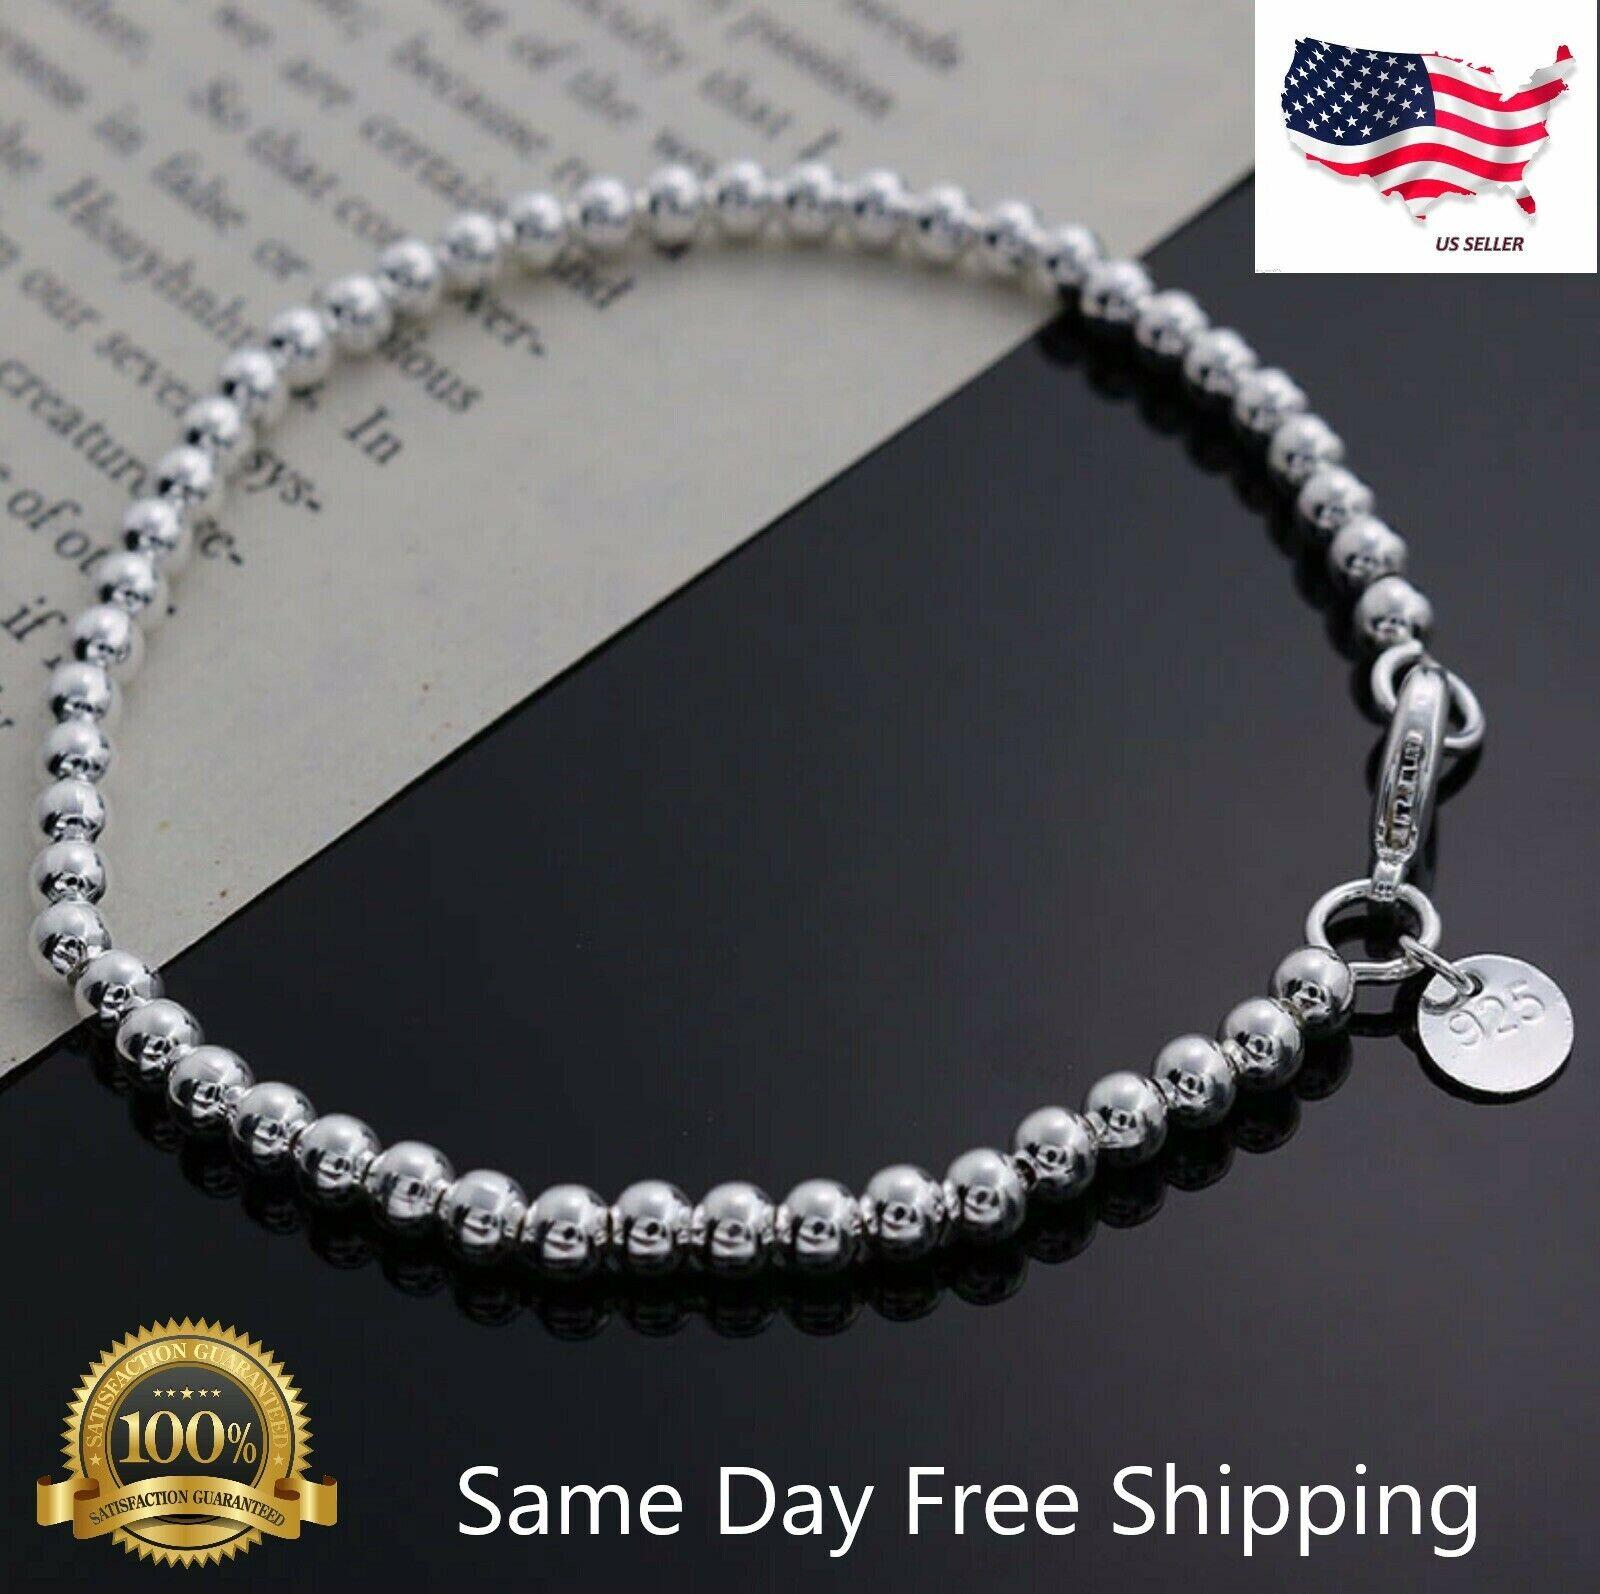 Jewellery - Womens 925 Sterling Silver Love Cuff Bead Ball Open Bangle Charm Bracelet